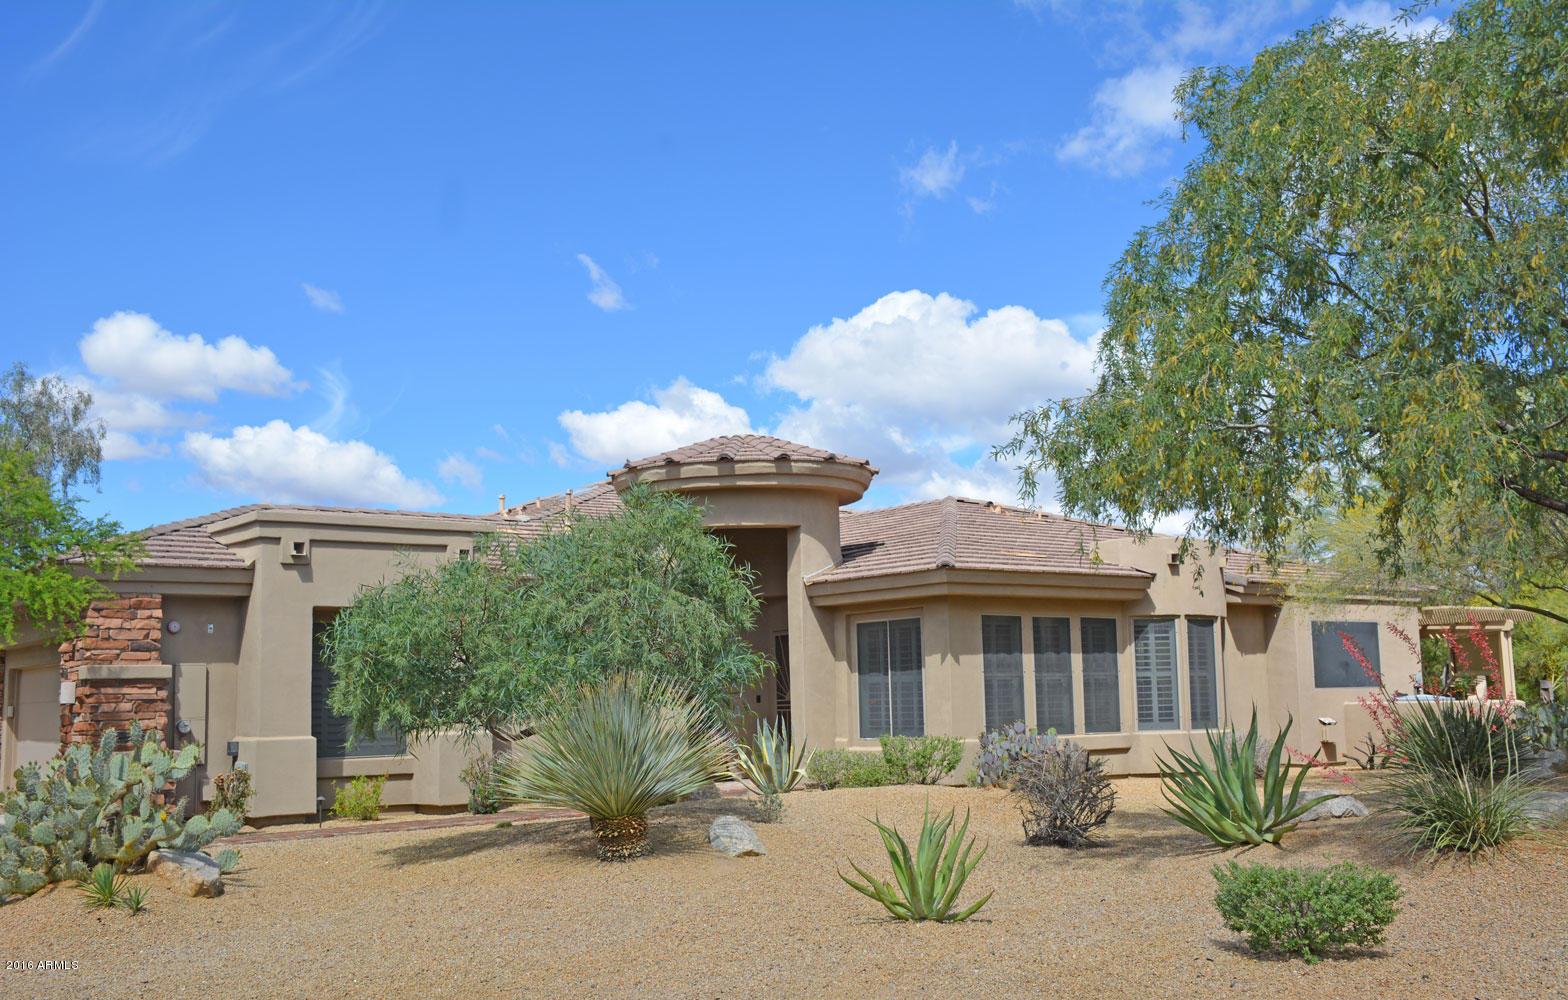 7298 E Sunset Sky  Circle  Scottsdale AZ 85266